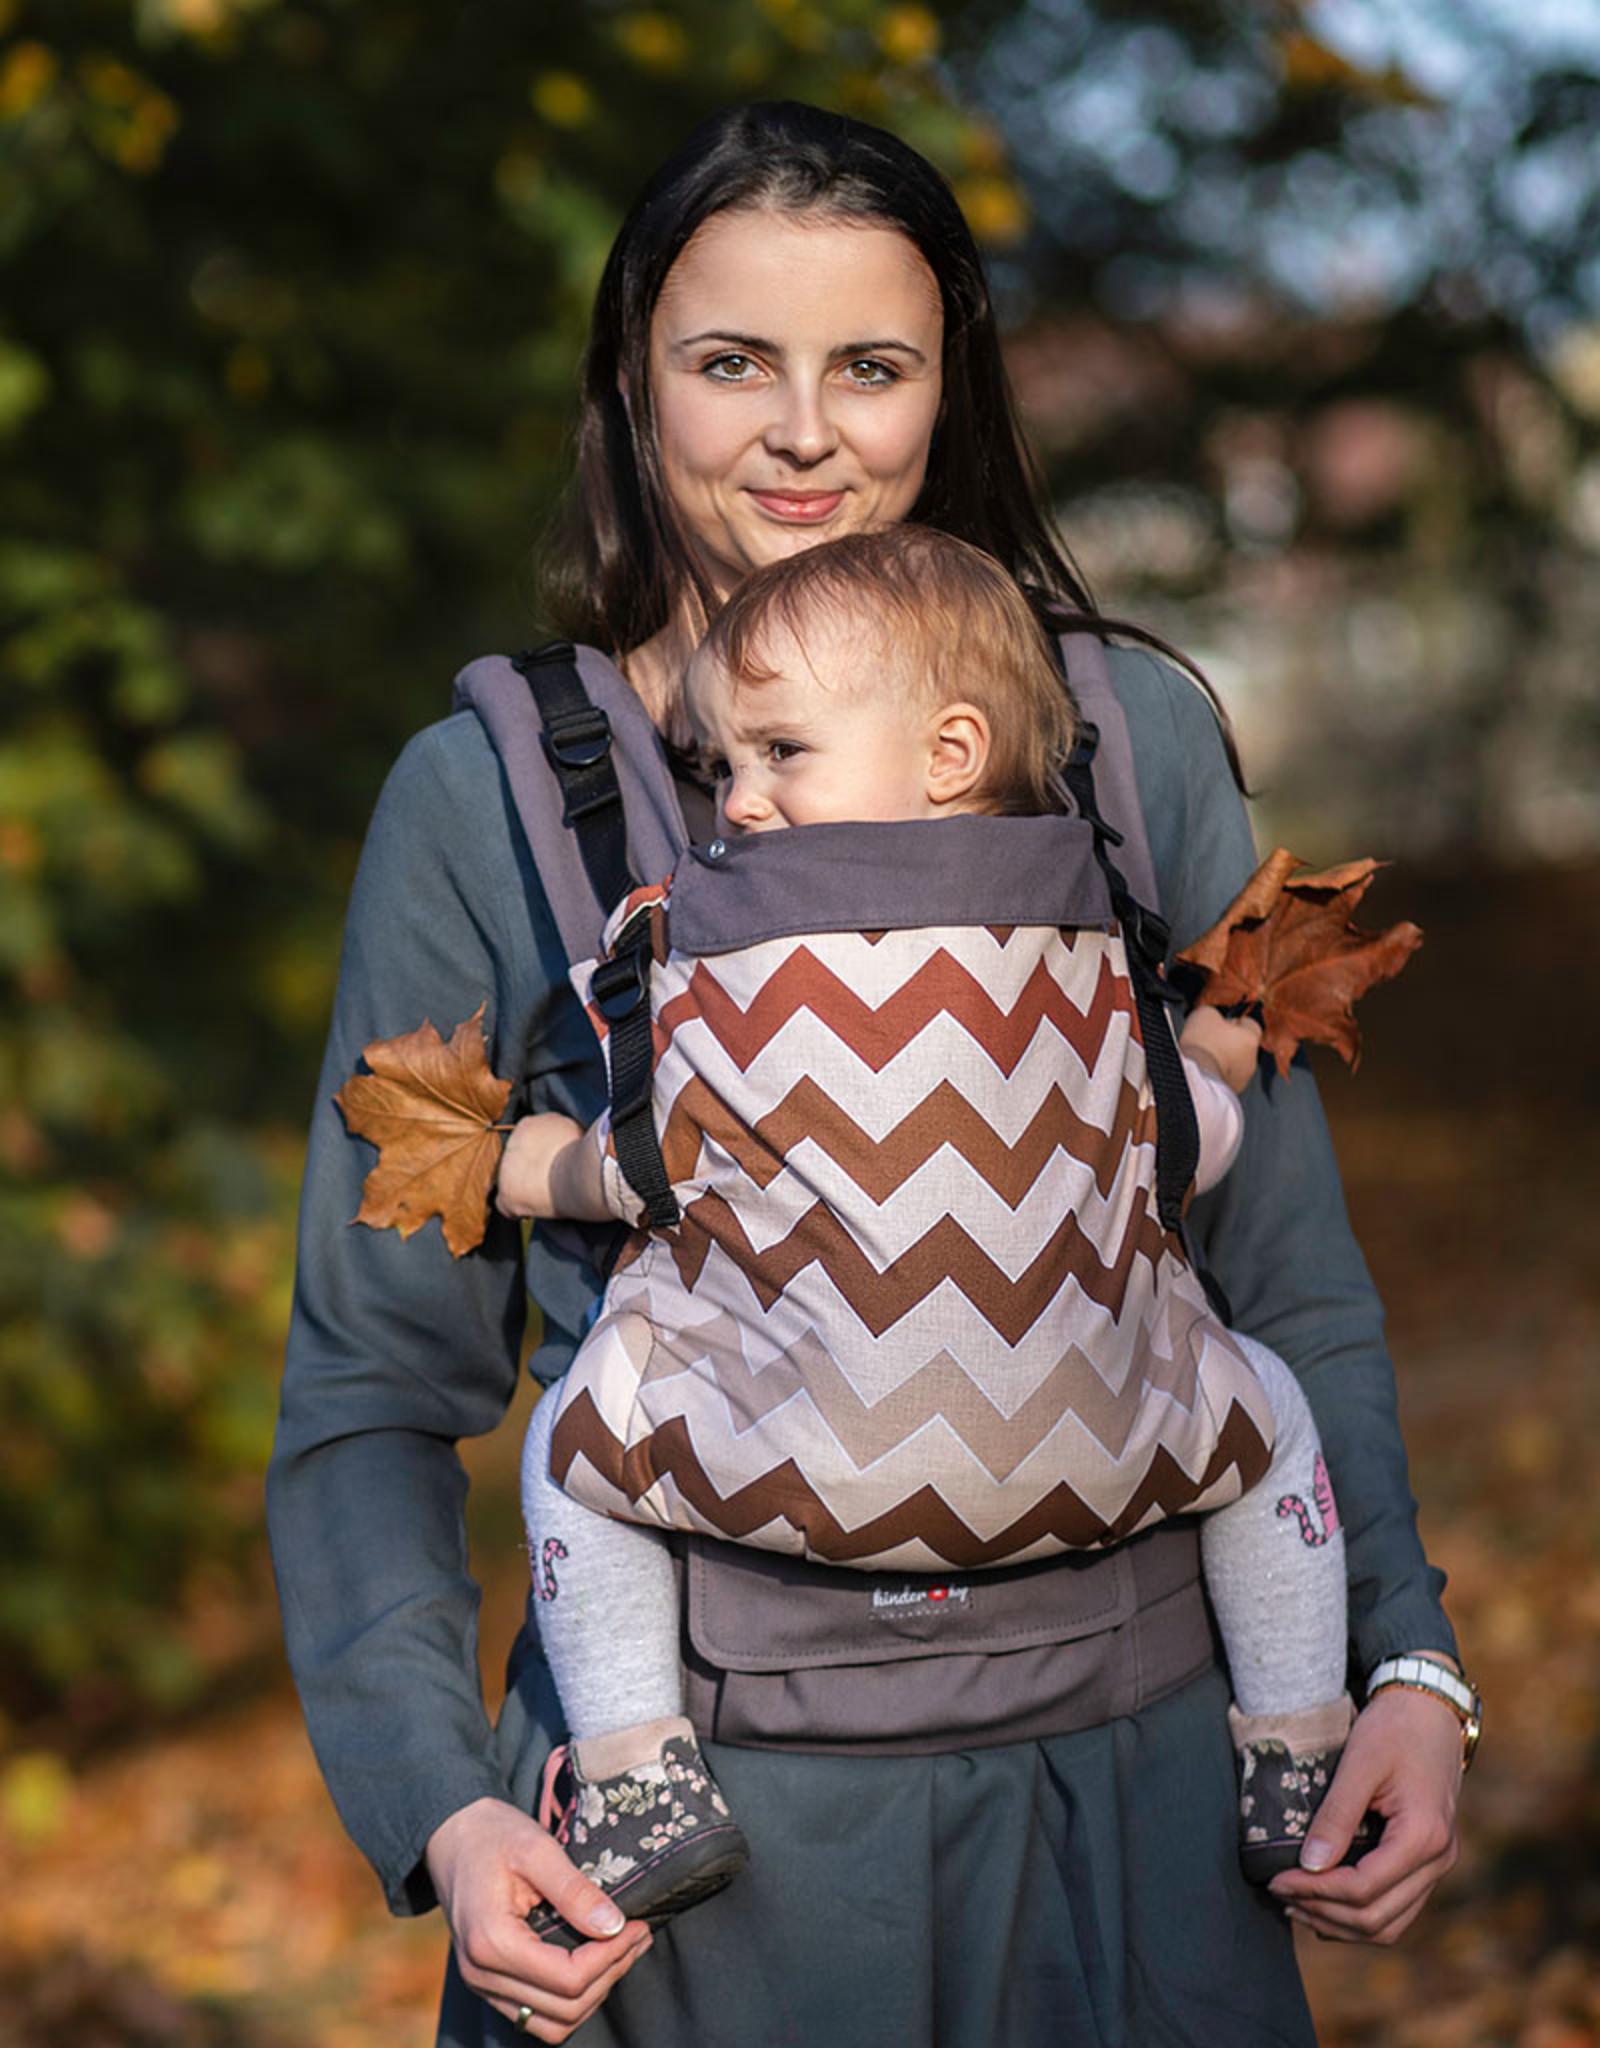 Kinderhop Baby Draagzak Multi Grow  Brown ZigZag